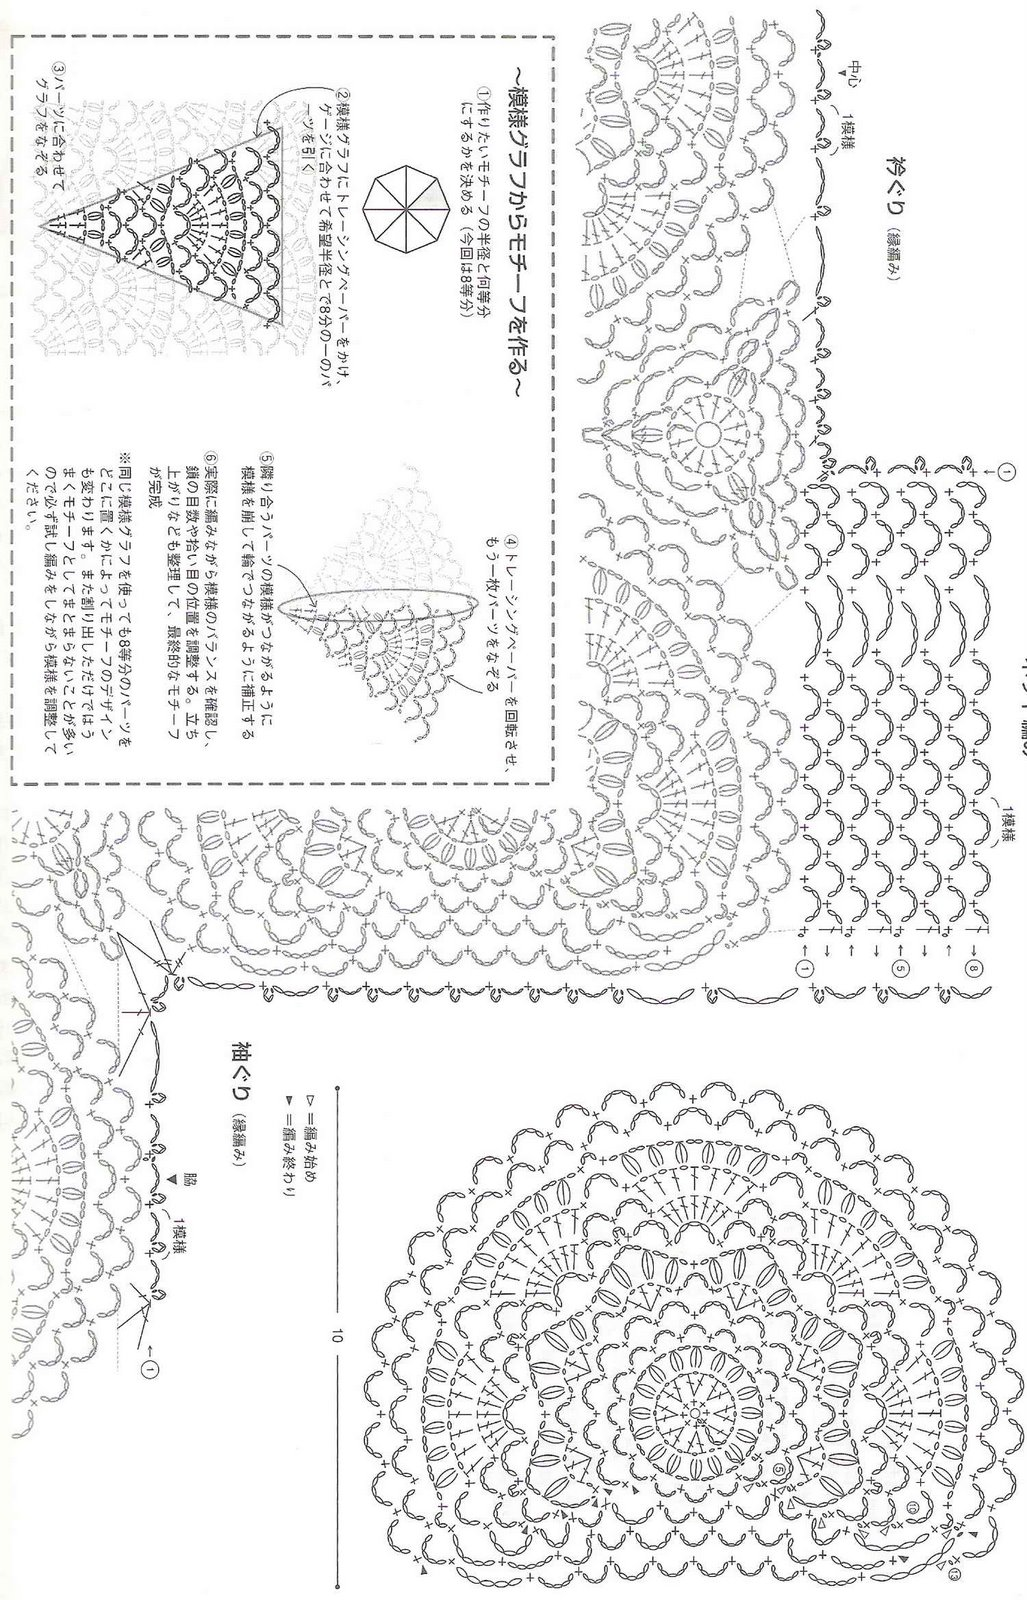 Amu 2008 03 下  - 荷塘秀色 - 茶之韵